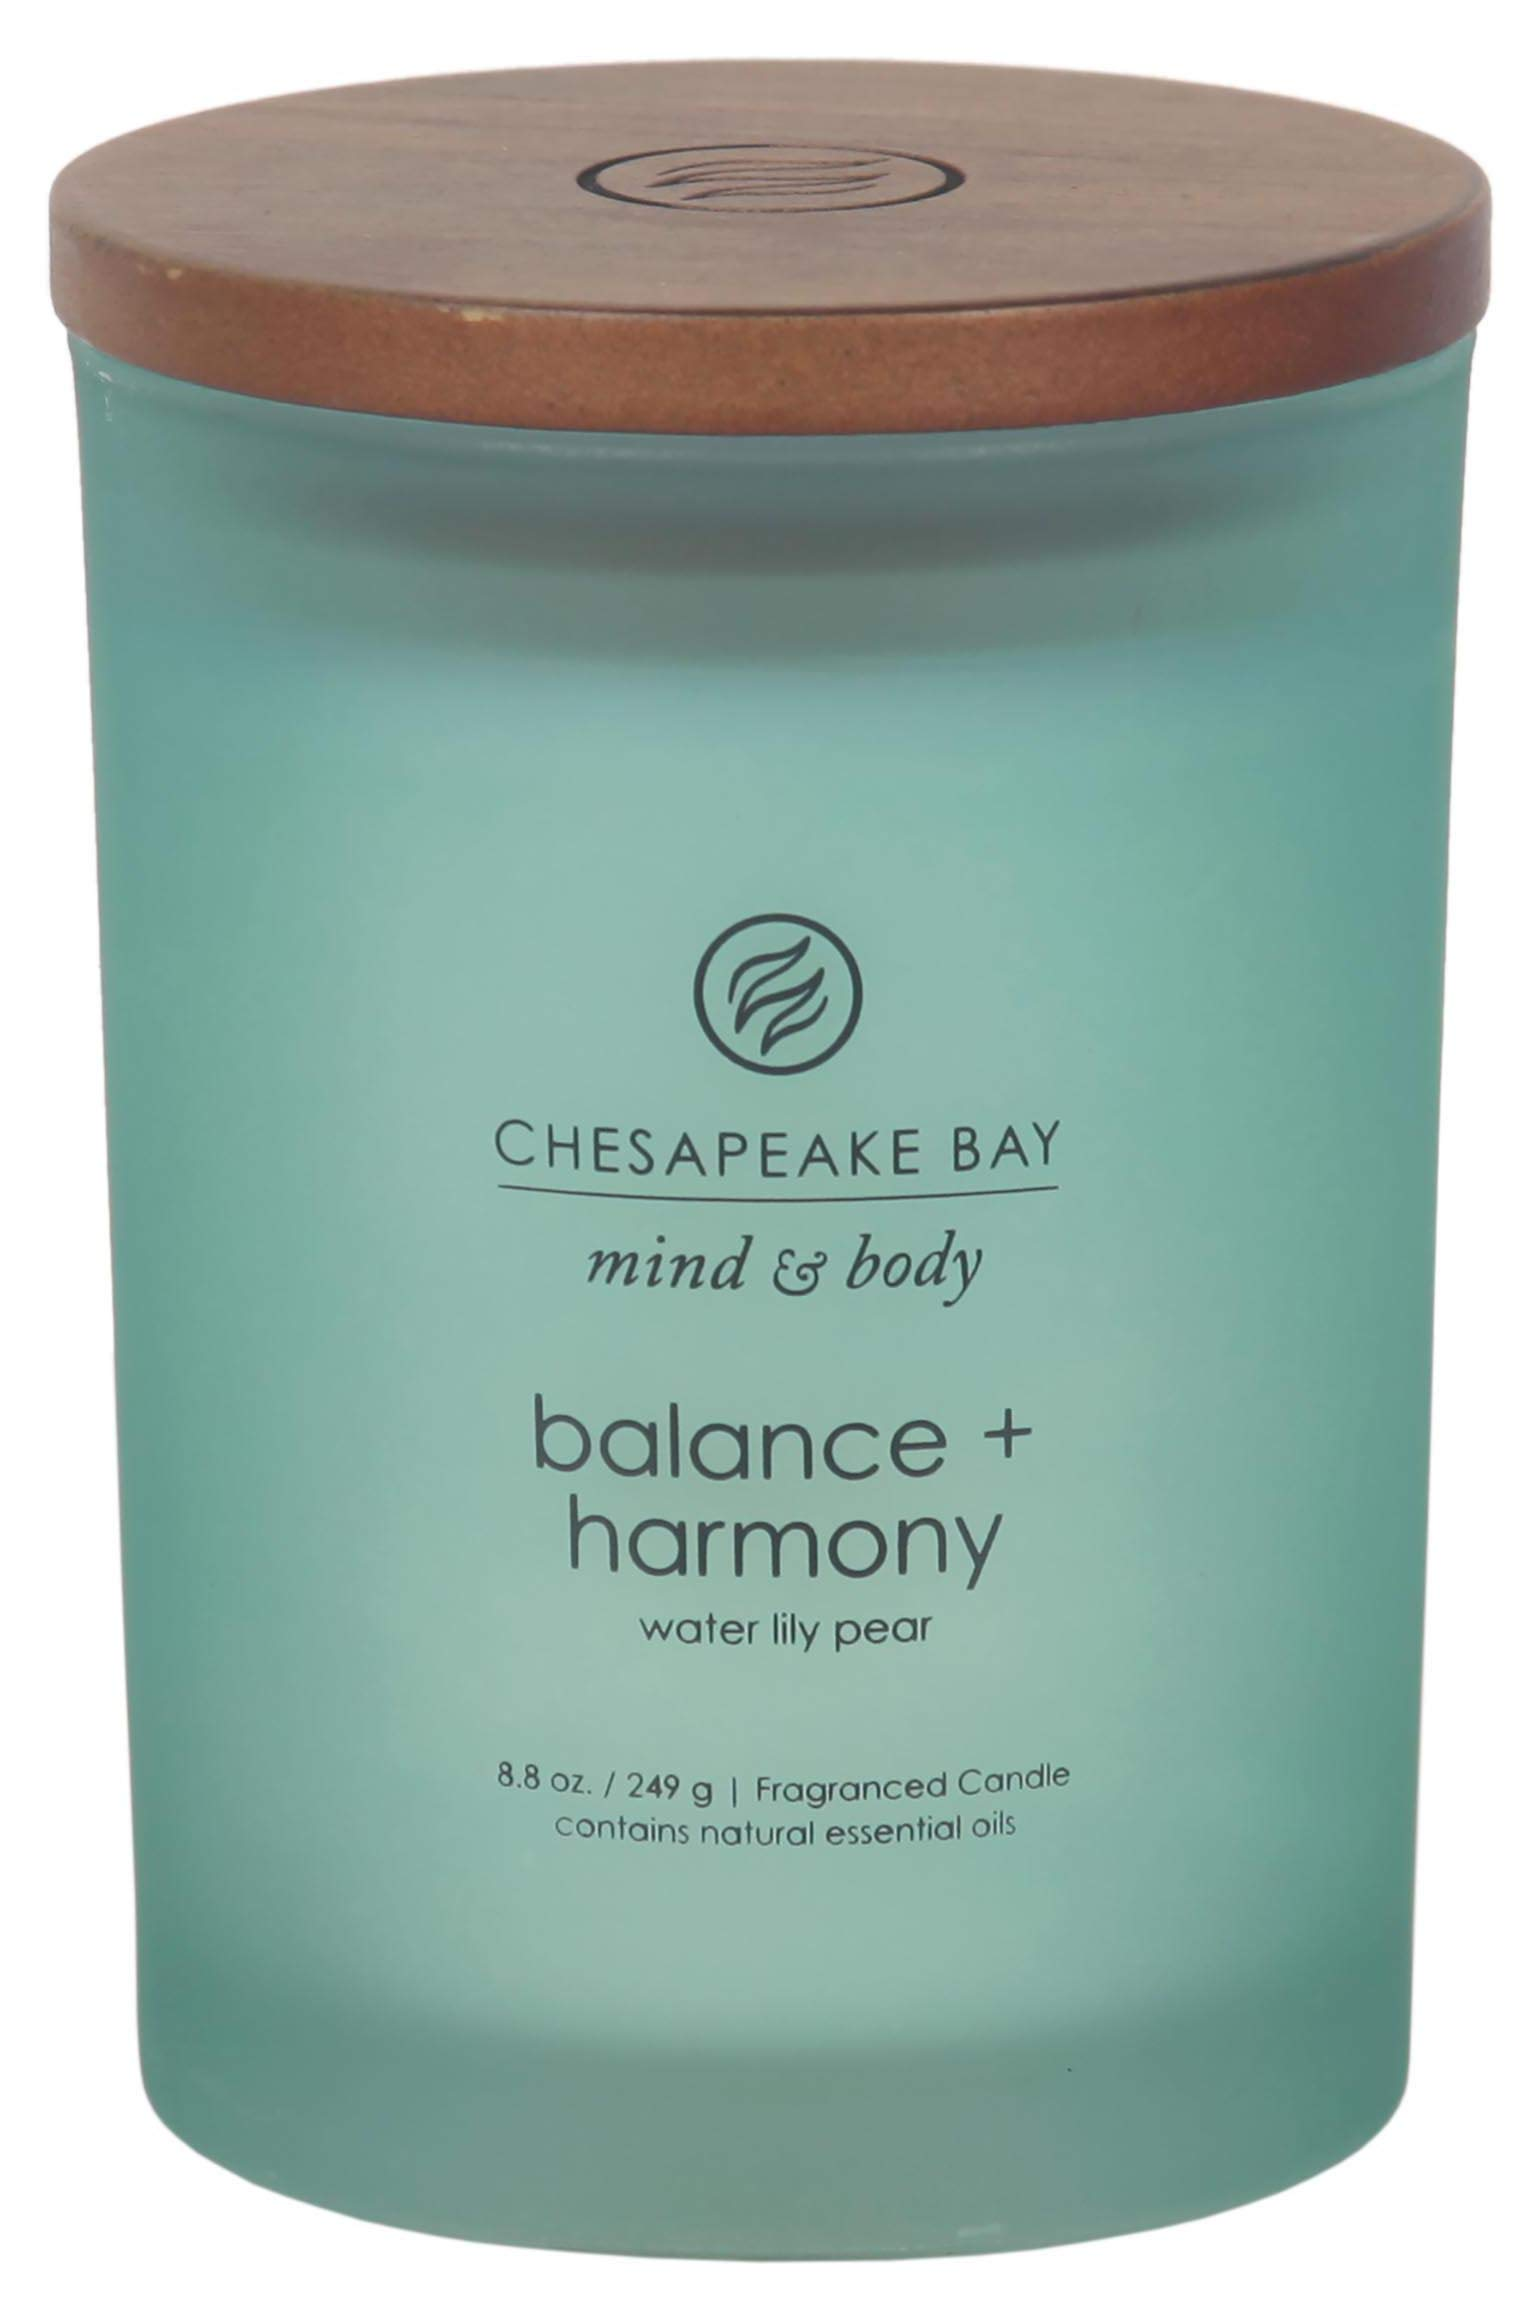 Chesapeake Bay Candle Balance Harmony